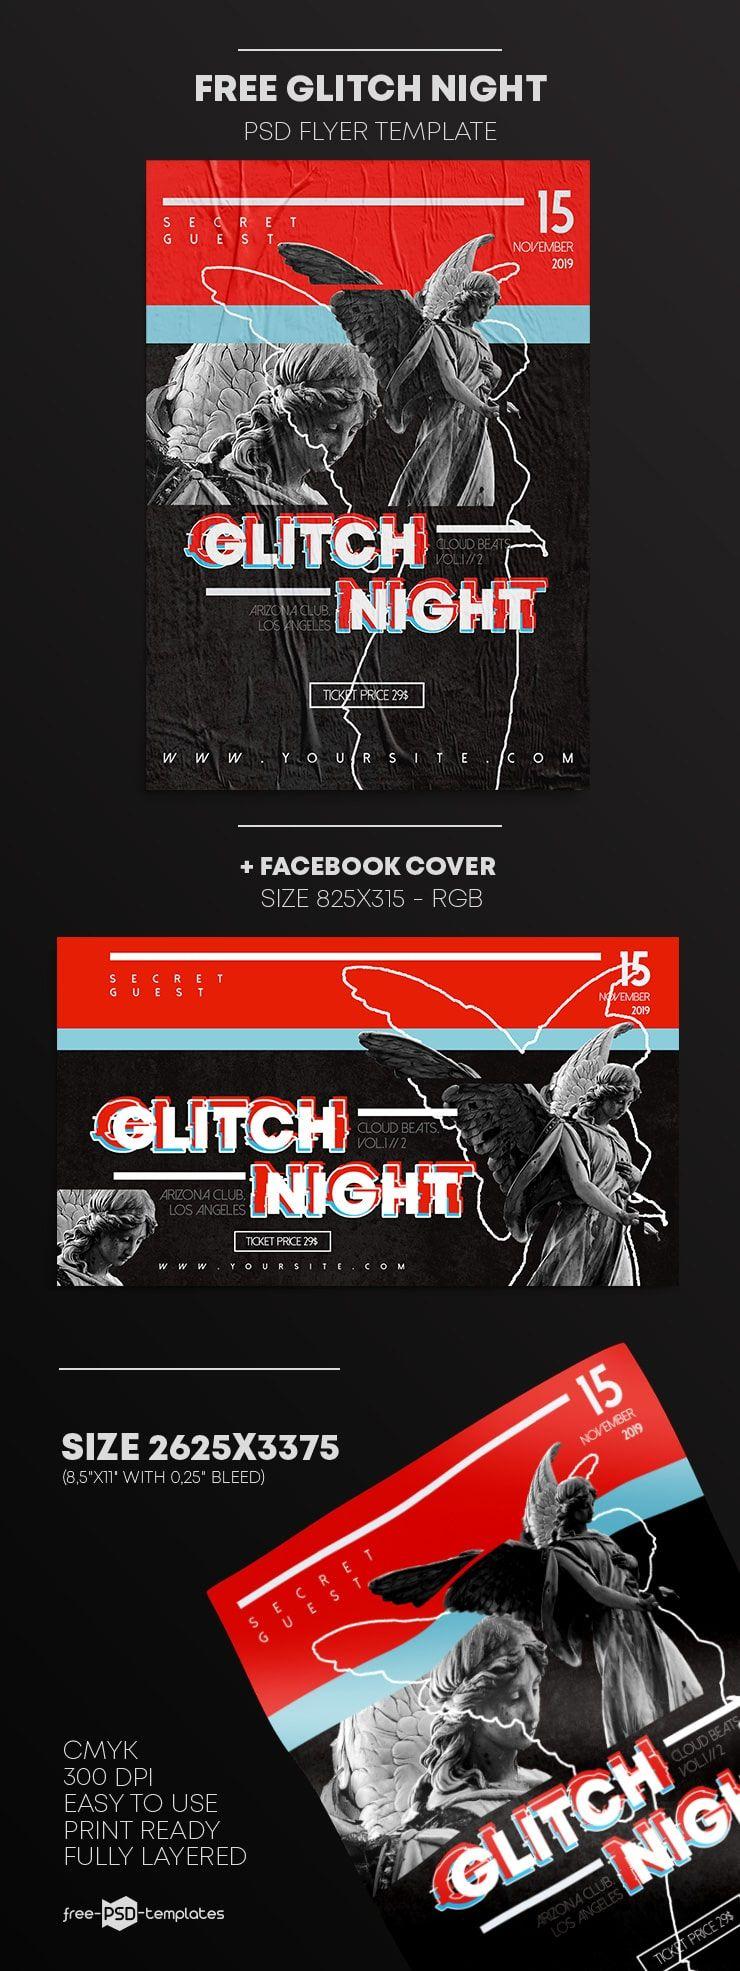 Free Glitch Night Flyer Template in PSD Motivasi